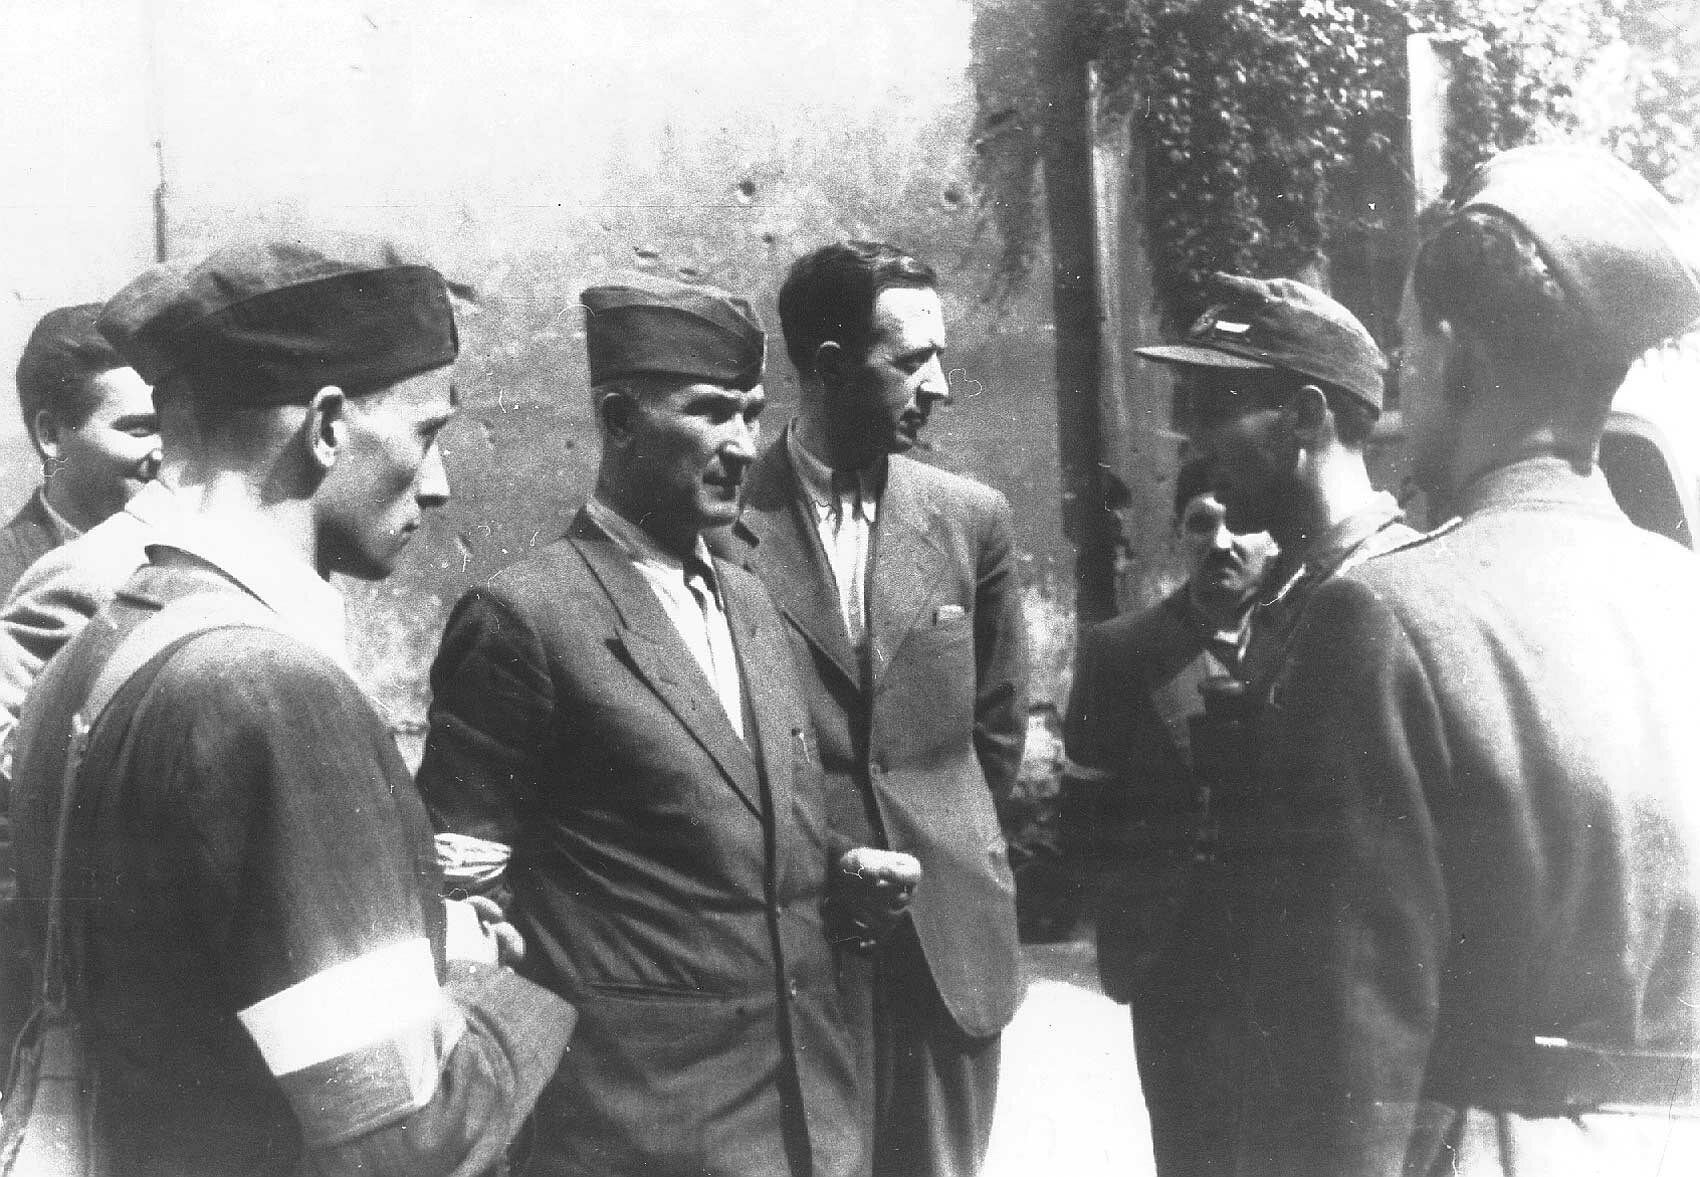 Jaki pseudonim nosił dowódca powstania, płk. Antoni Chruściel?